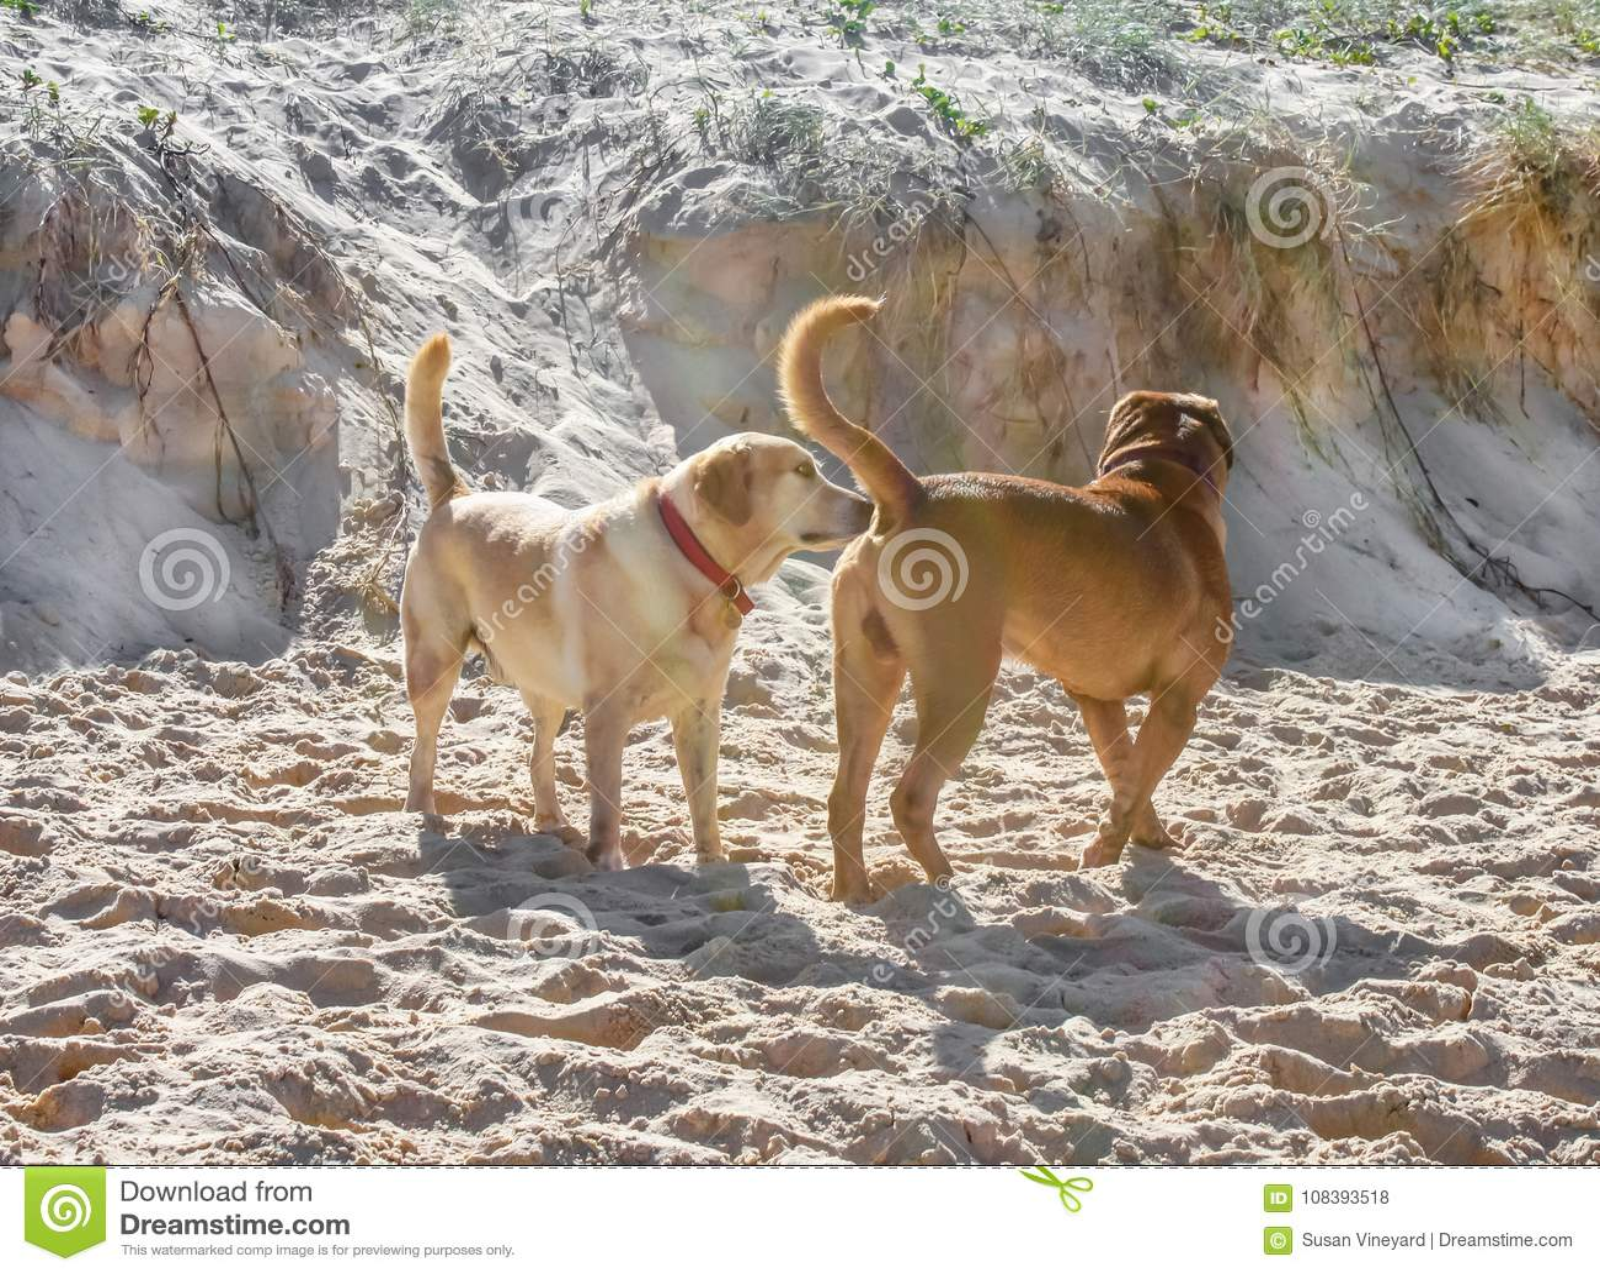 Congratulate, this dog sniffs girls ass prompt reply